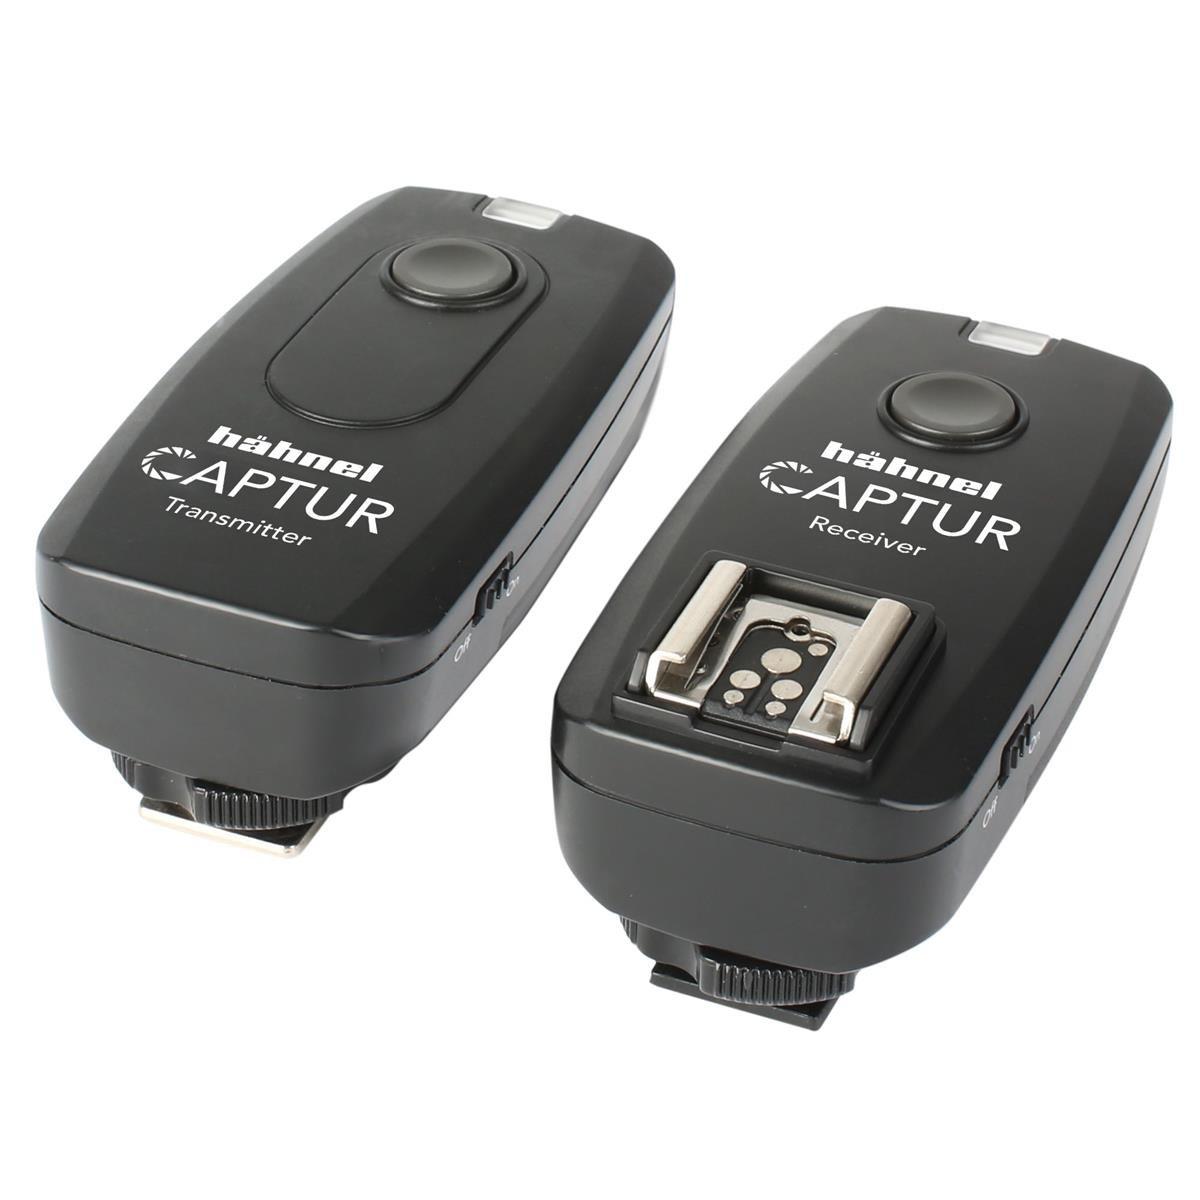 Captur Transmitter Receiver Set - Fuji